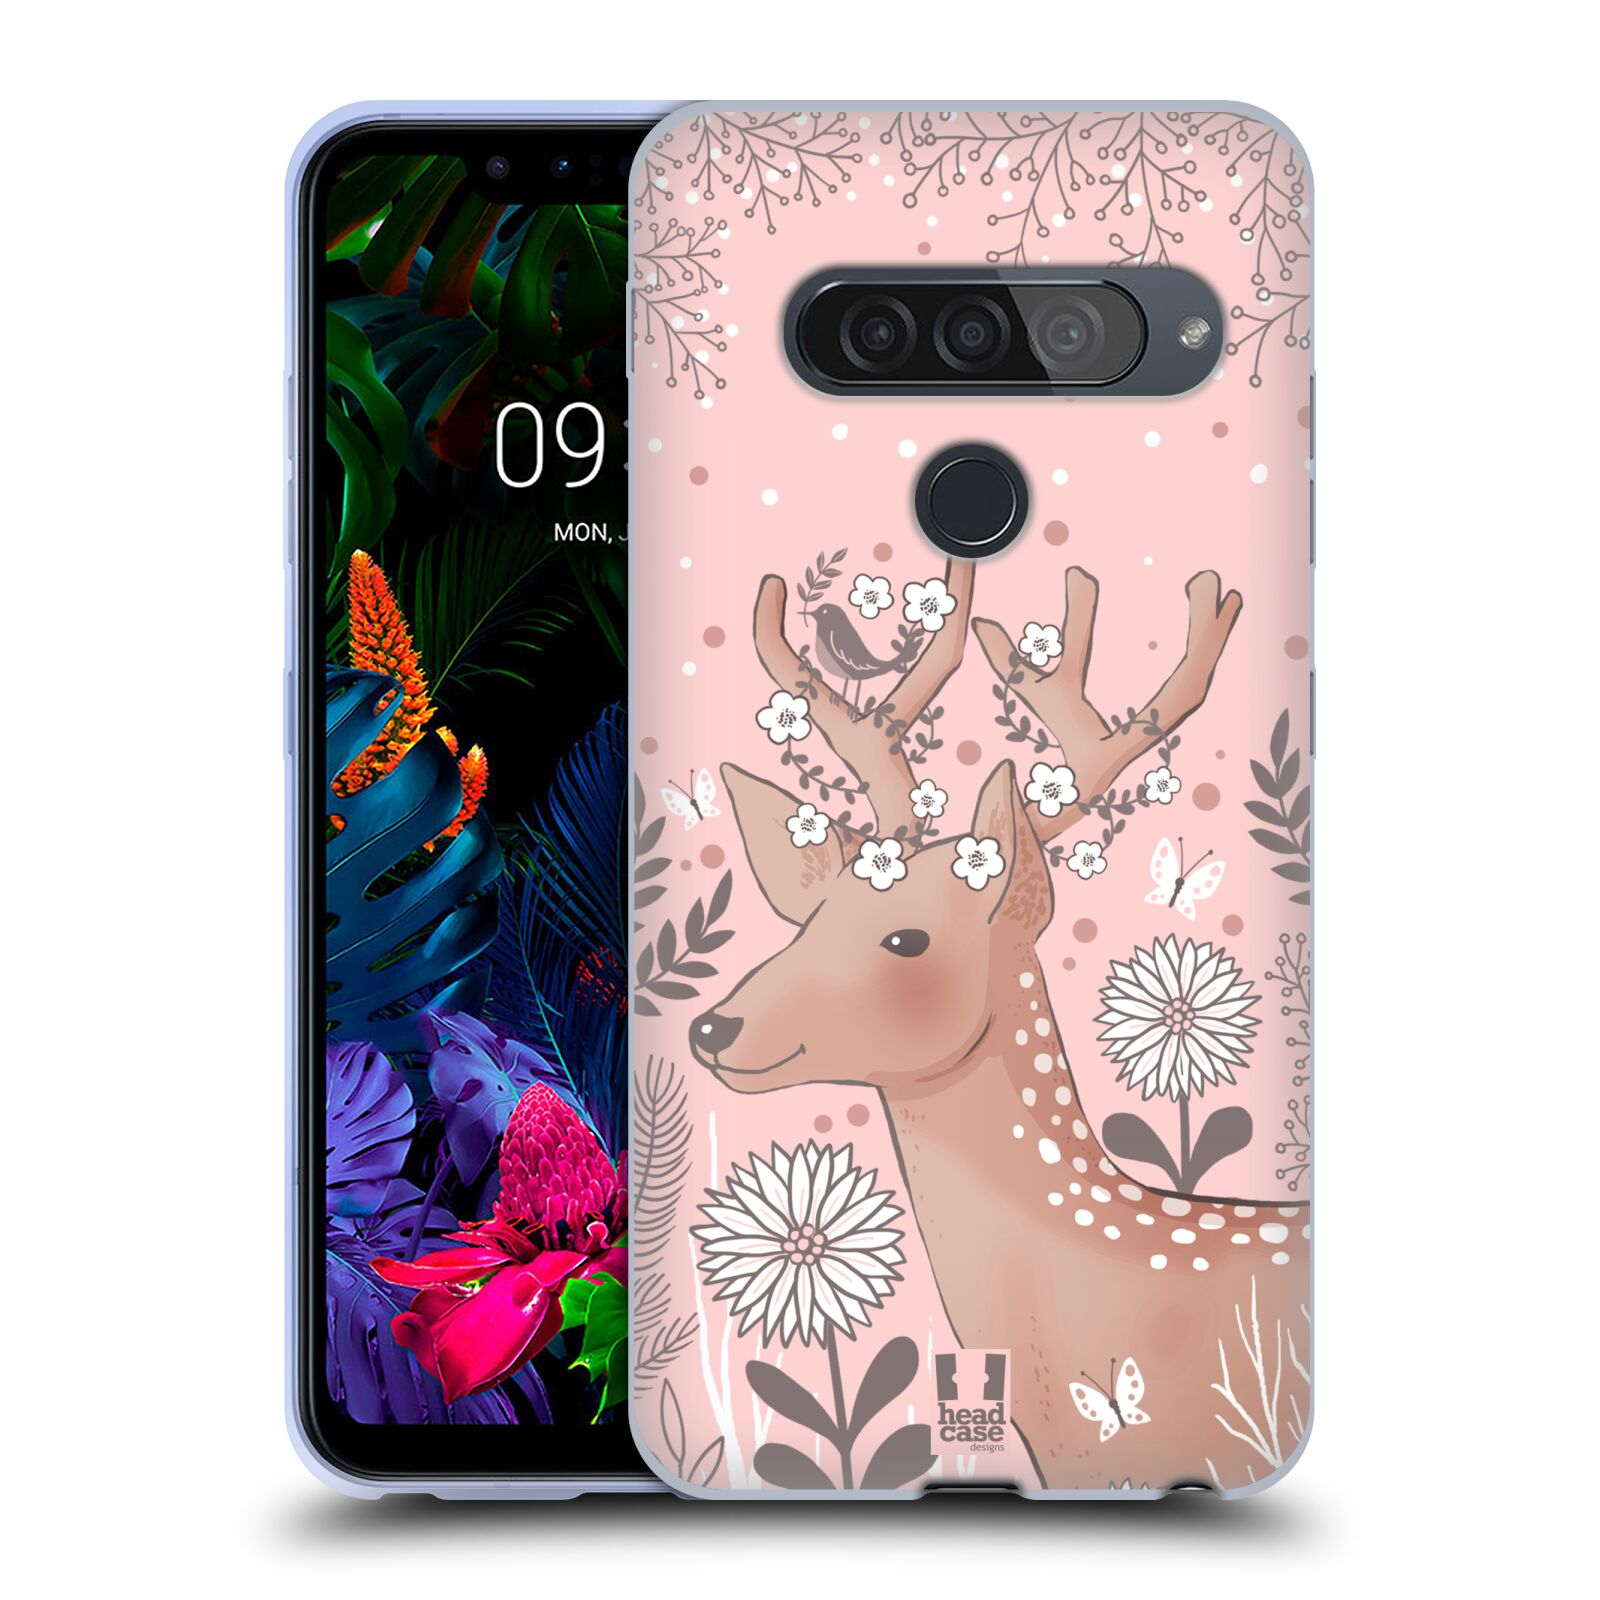 Silikonové pouzdro na mobil LG G8s ThinQ - Head Case - Jelíneček